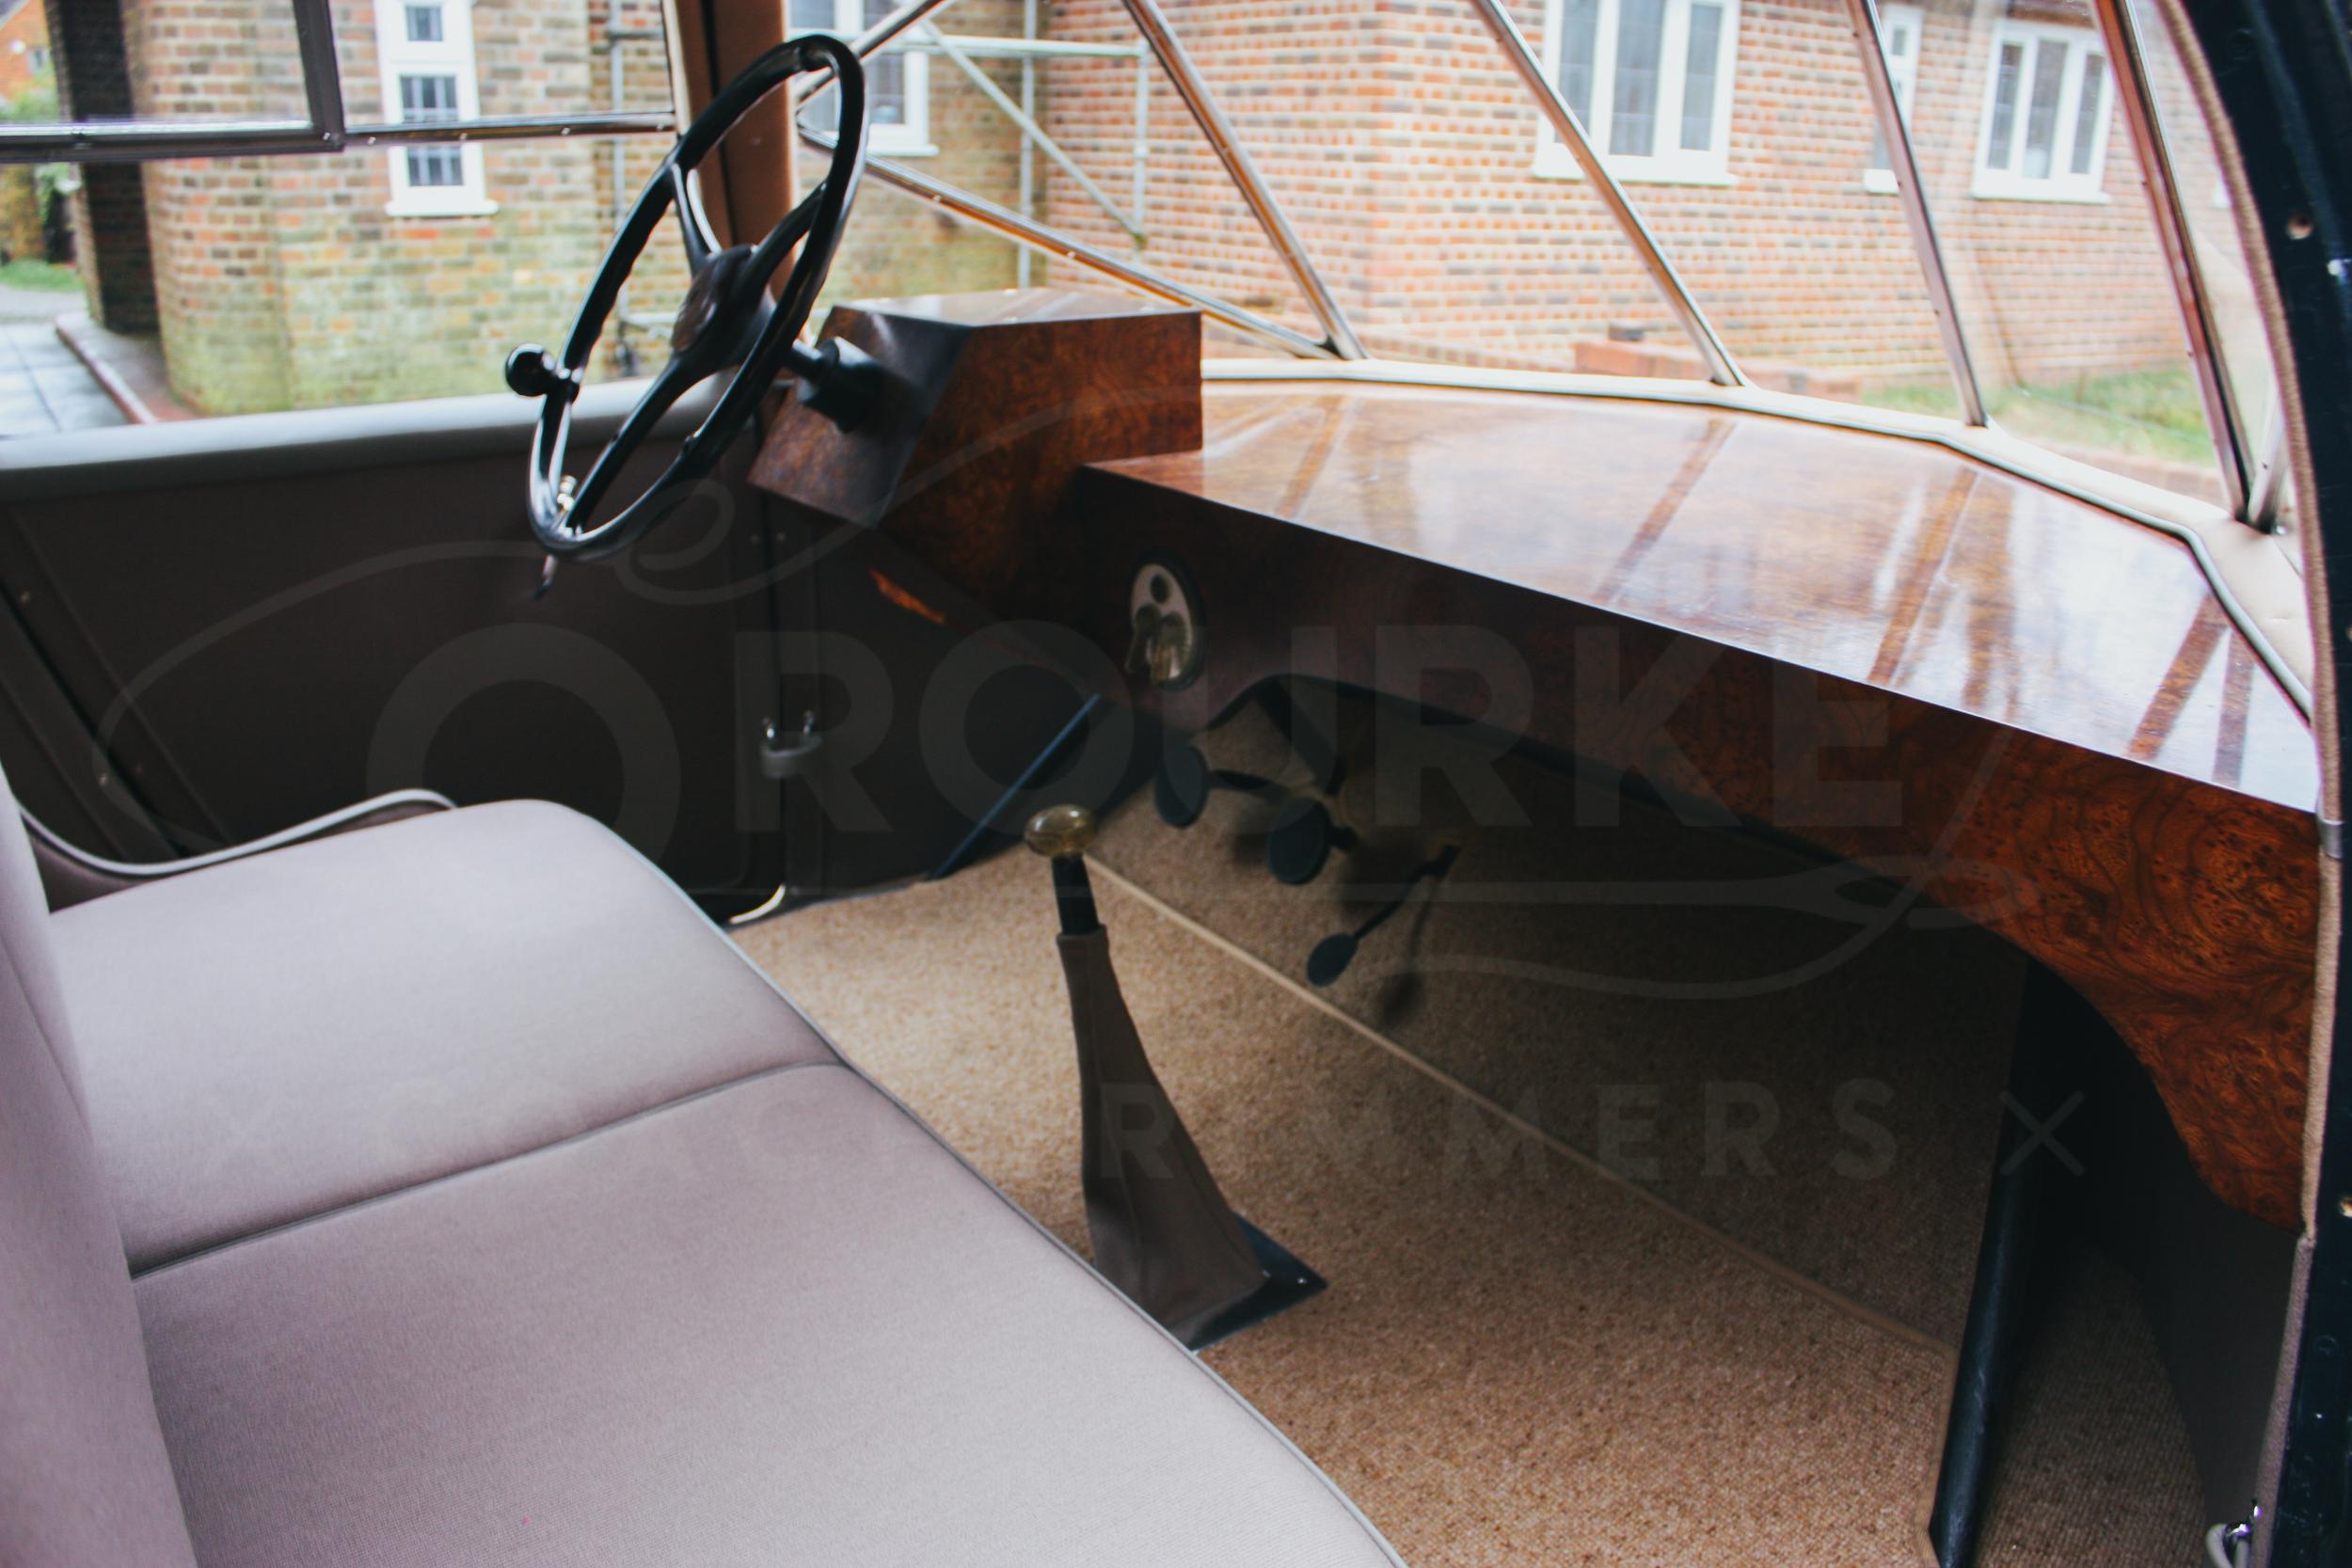 o-rourke-coachtrimmers-dymaxion-car-3-5.jpg